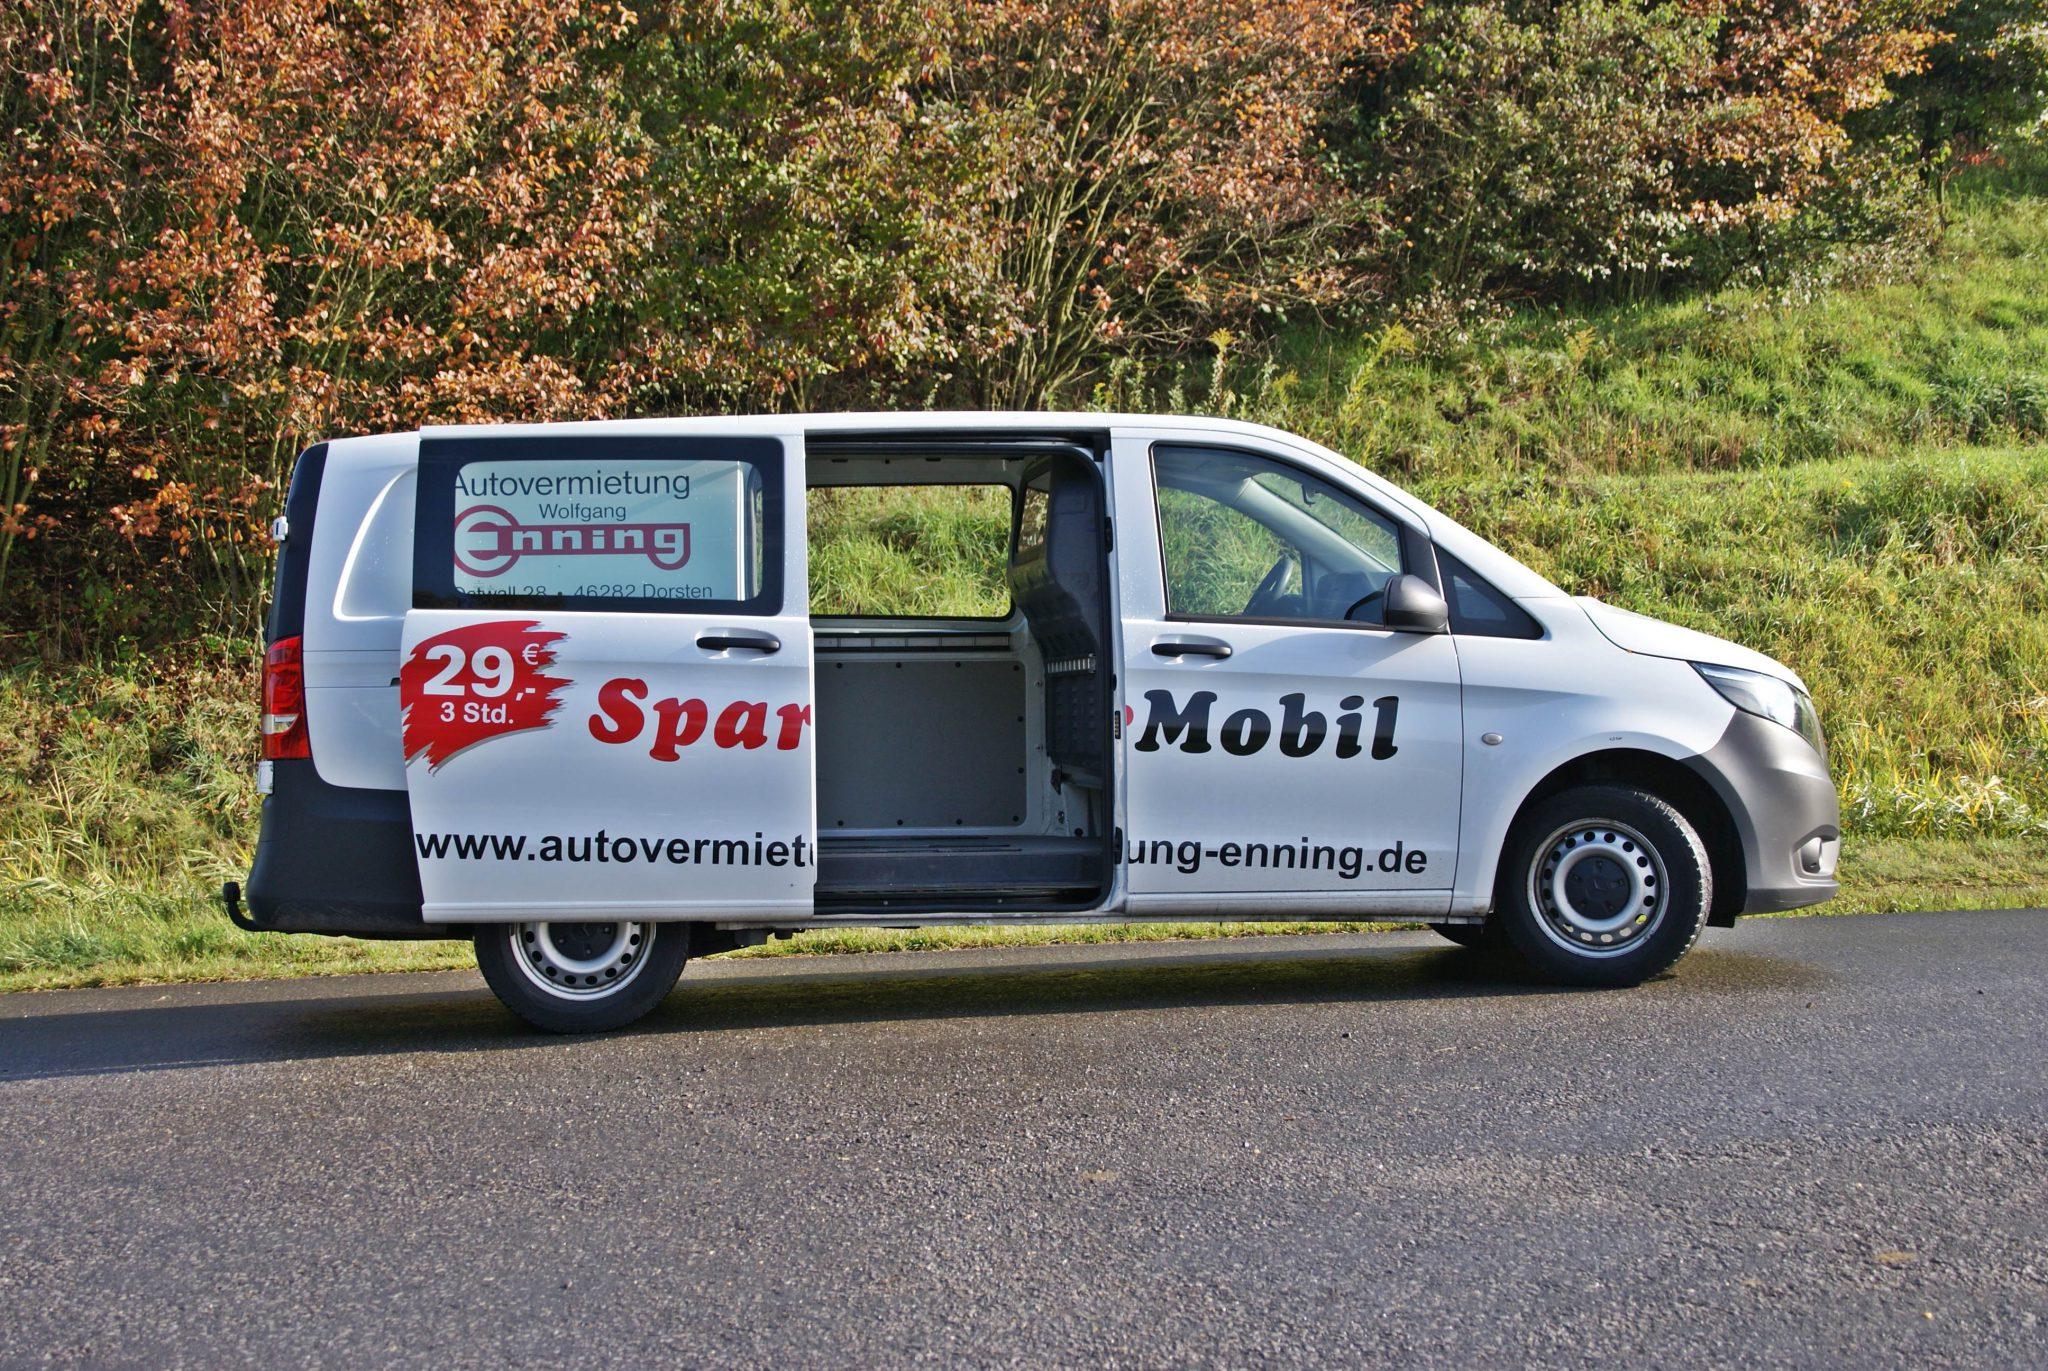 Mercedes Vito Transporter Sparmobil Autovermietung Enning Dorsten